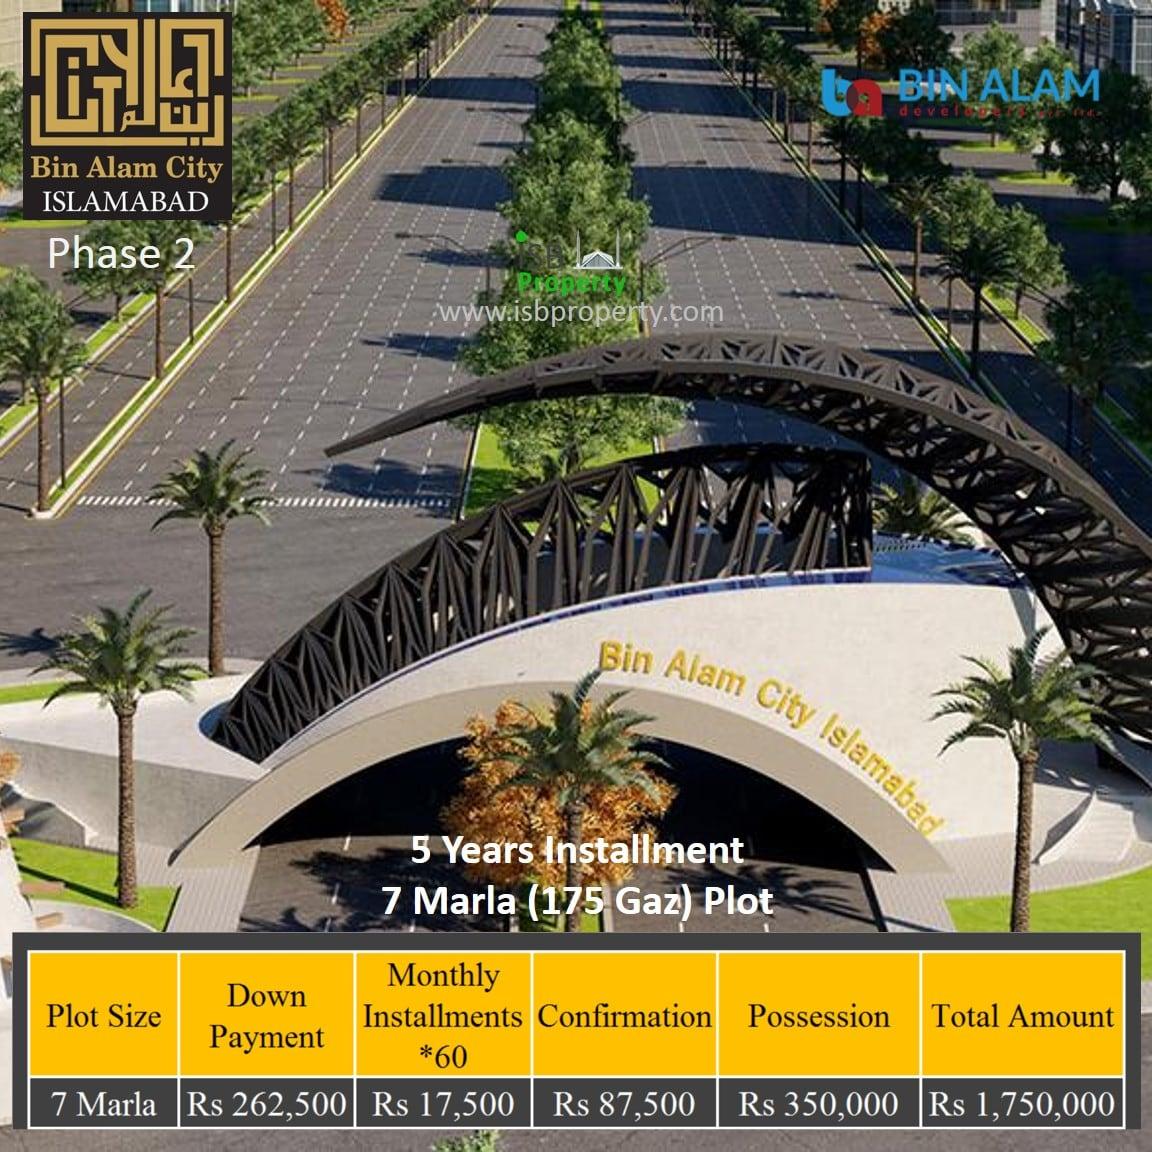 7 Marla Plot at Bin Alam City Islamabad Phase 2